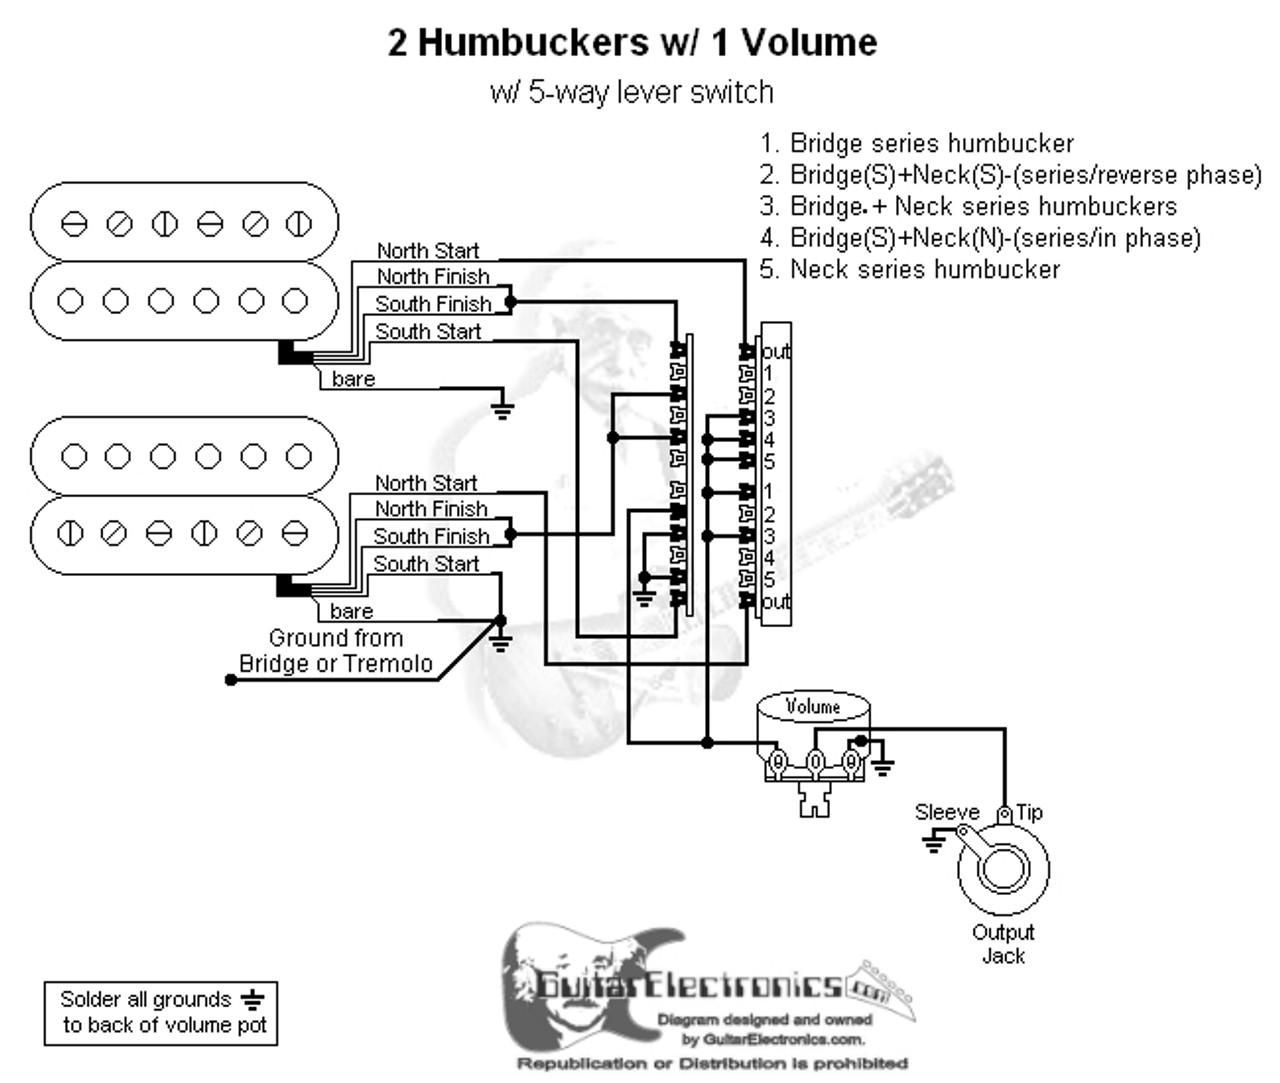 wiring diagram 2 humbuckers 5way lever switch 1 volume 1 tone 03 art of tone wiring diagram [ 1280 x 1083 Pixel ]